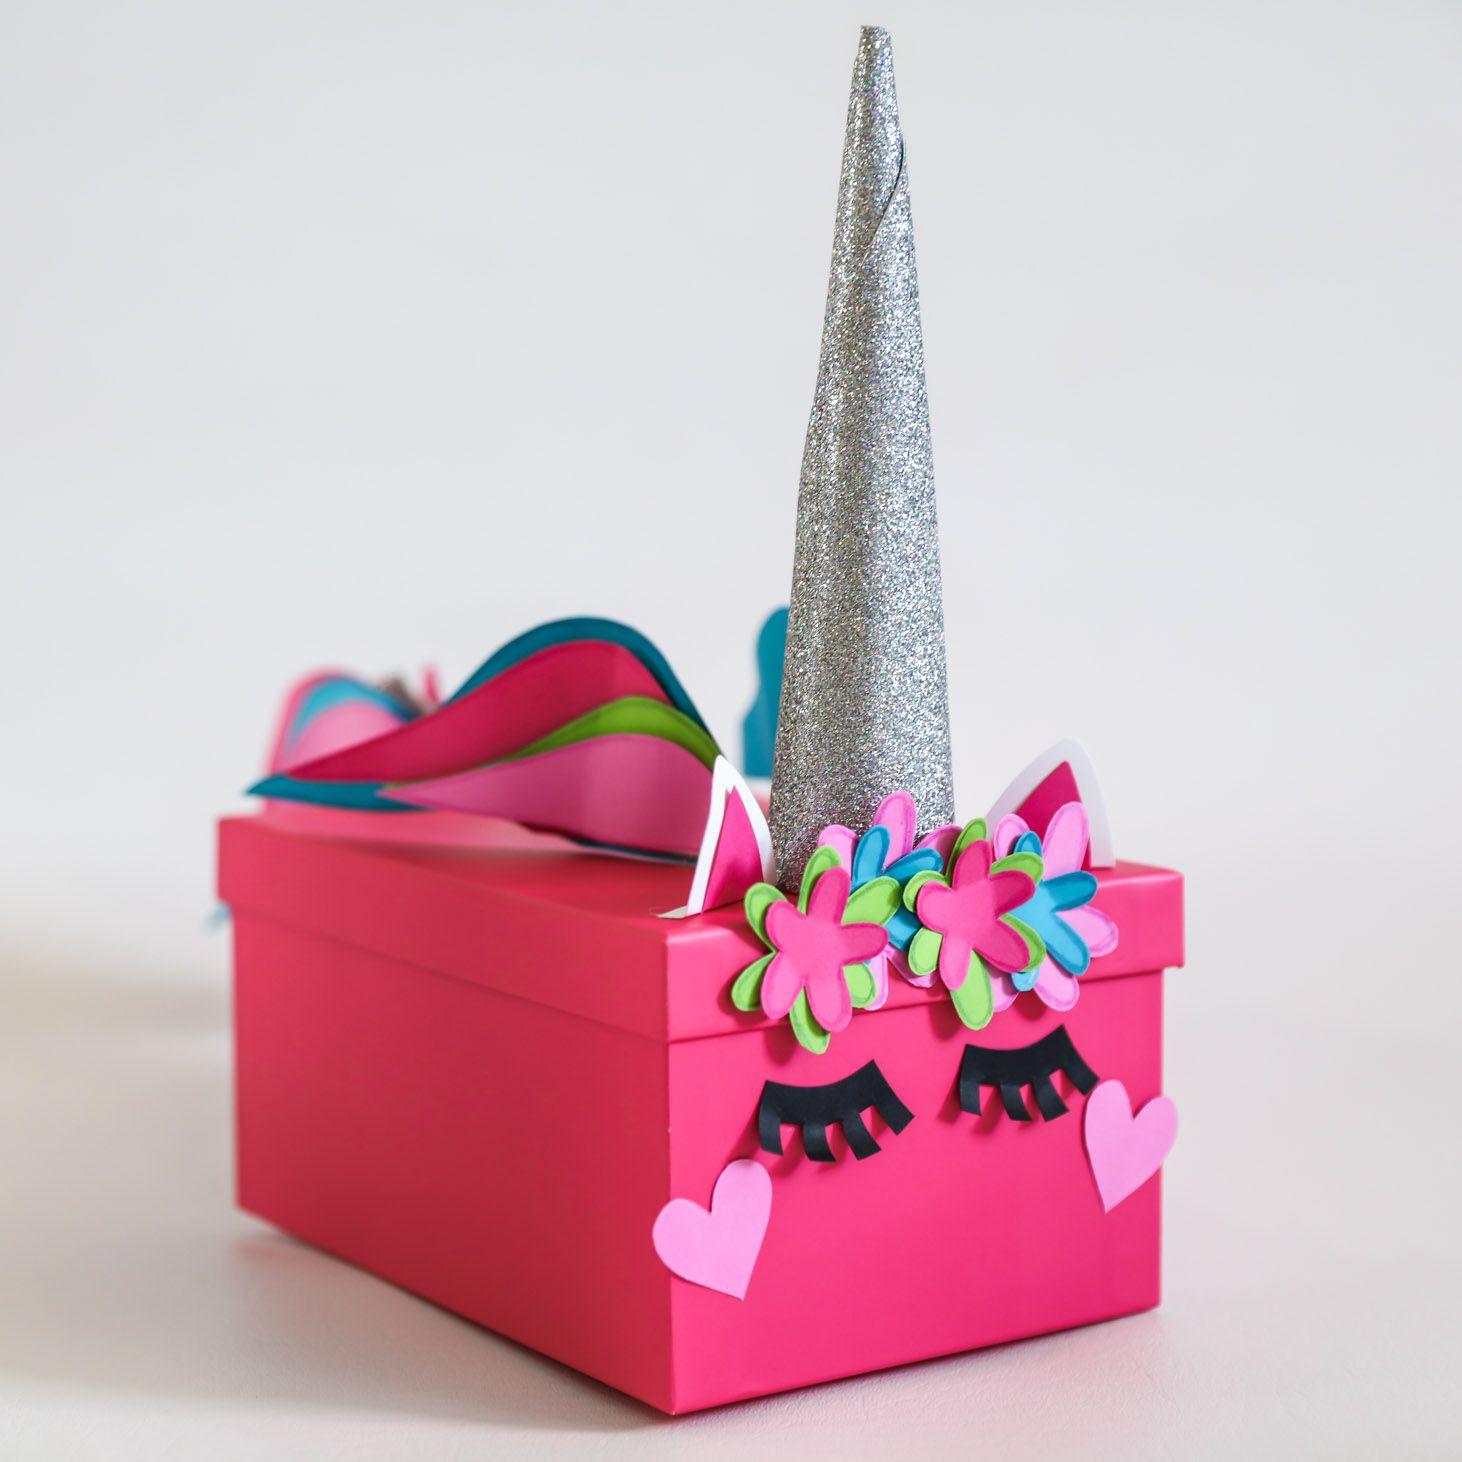 Valentines Box Ideas - Step-by-Step Unicorn, Robot & More!   Lil' Luna